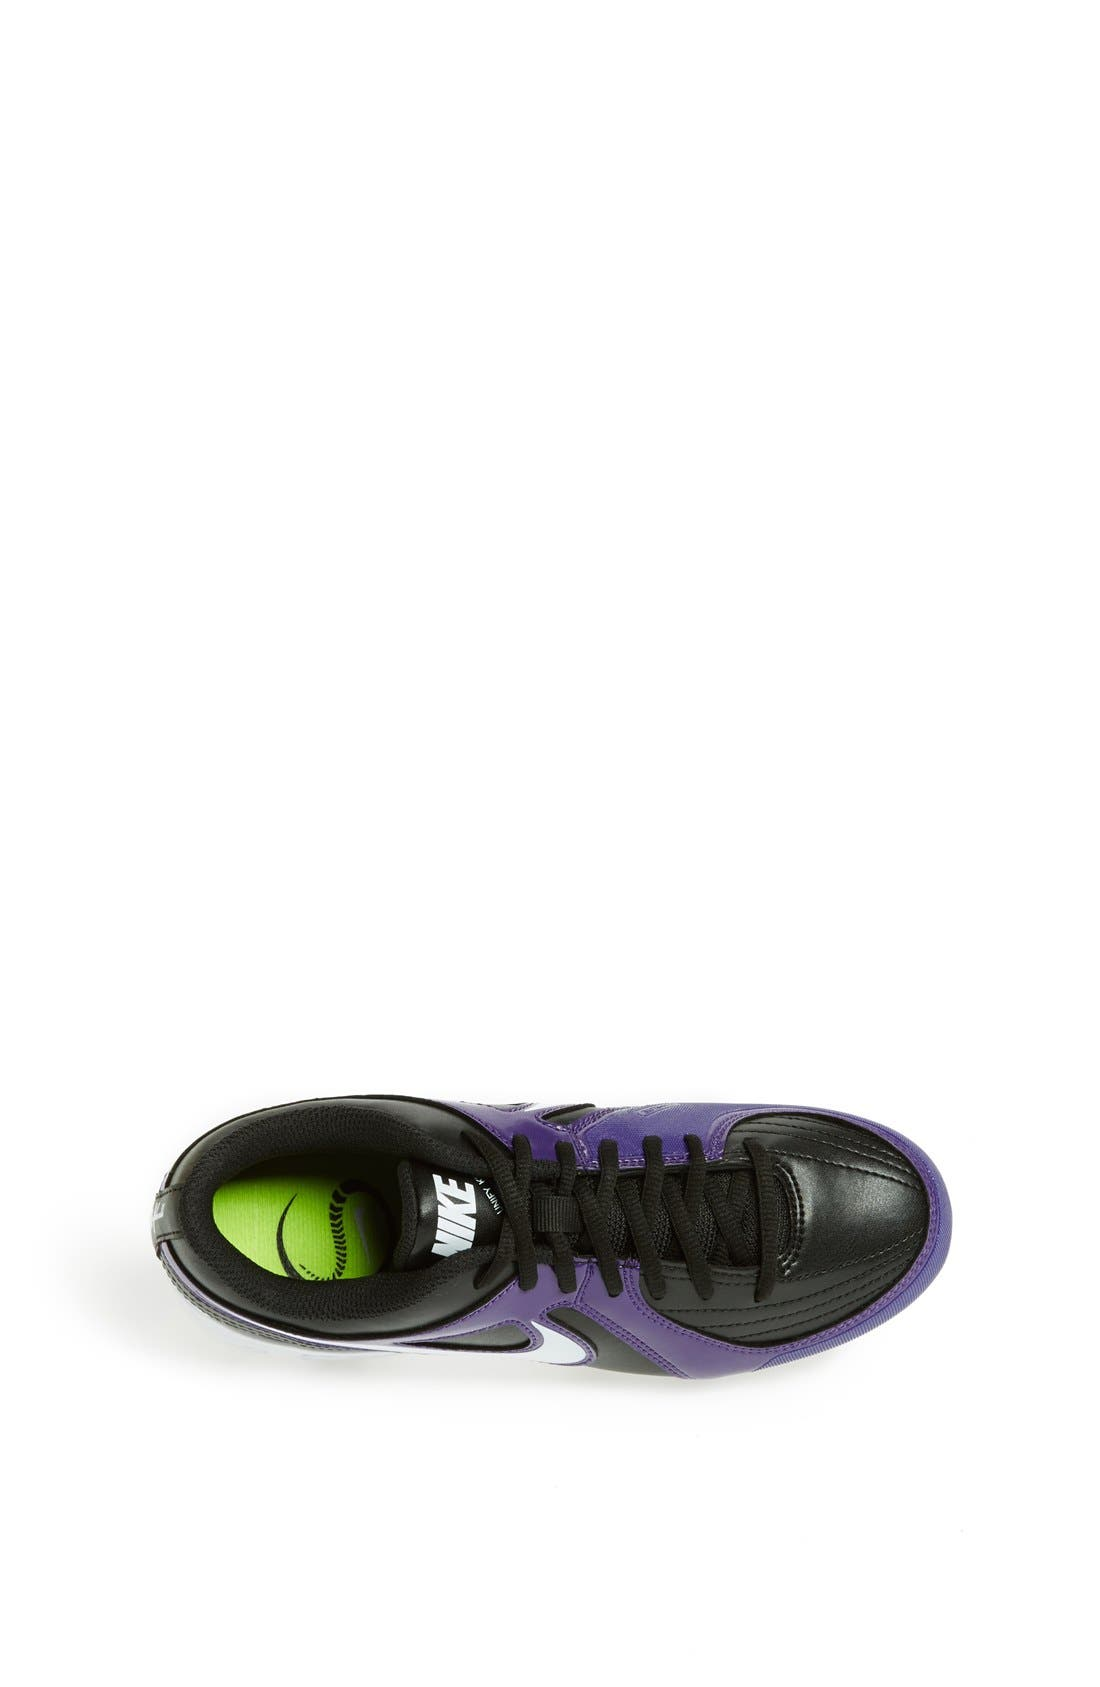 Alternate Image 3  - Nike 'Unify Keystone' Softball Cleat (Toddler, Little Kid & Big Kid)